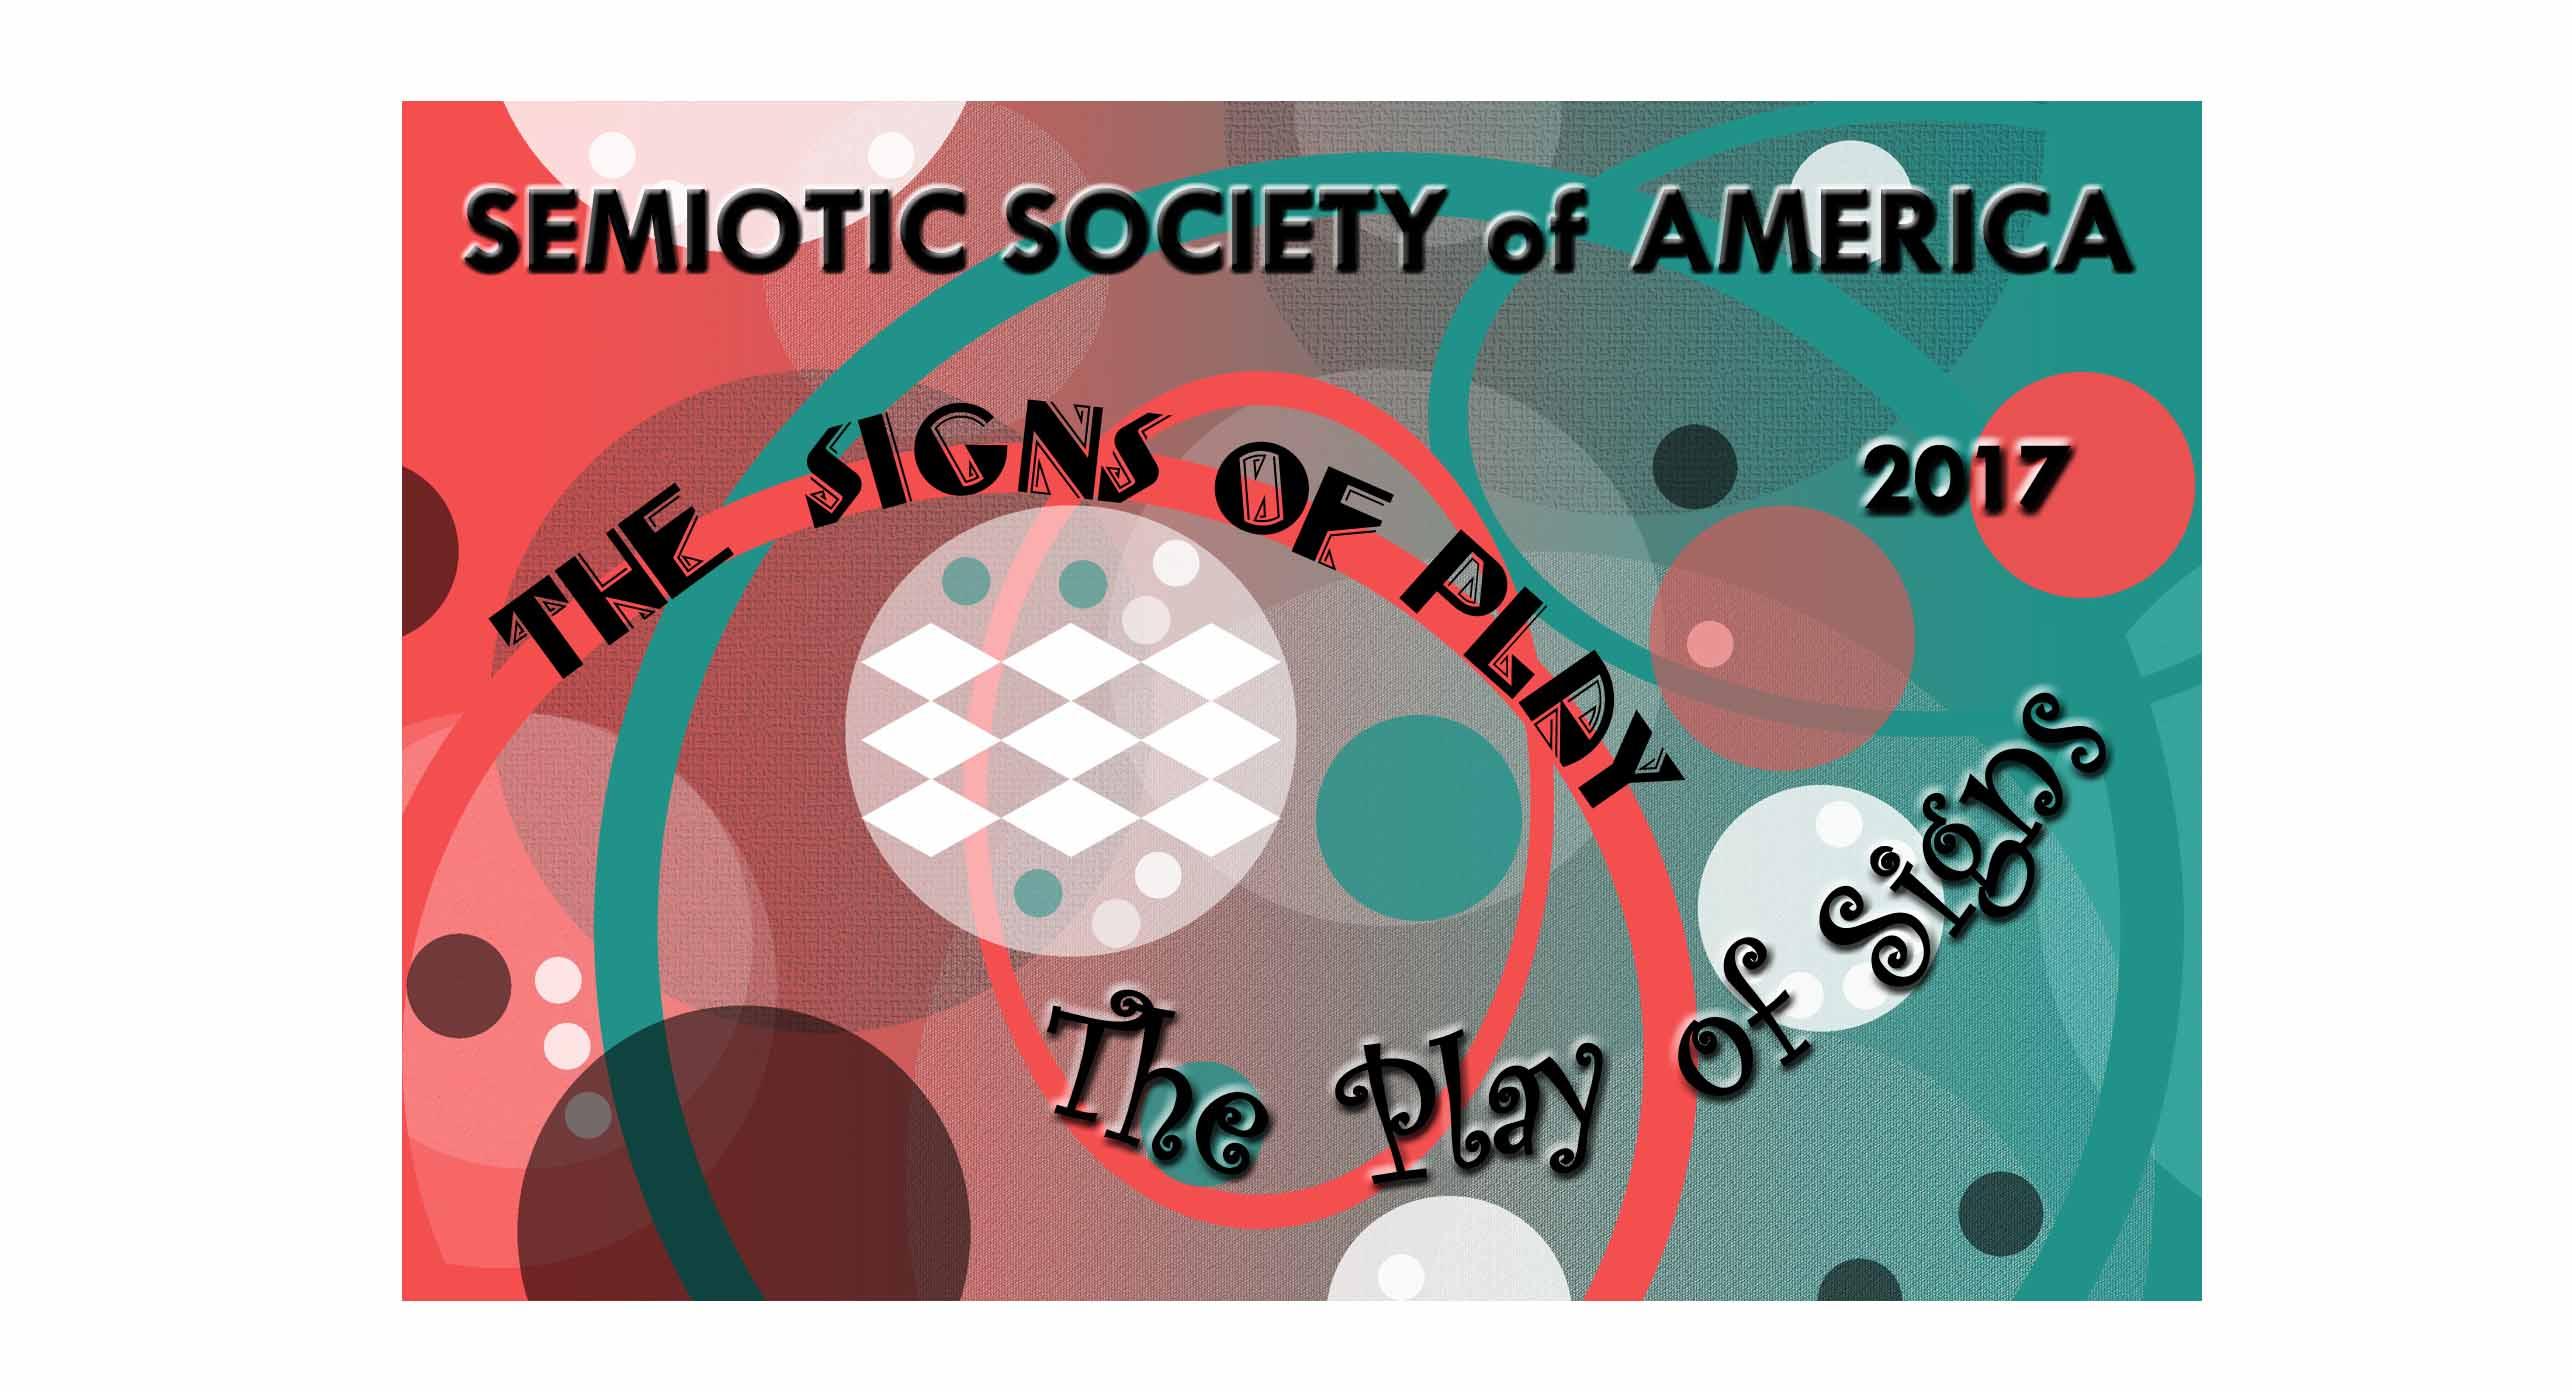 CFP: The SSA 42nd Annual Meeting | IASS-AIS